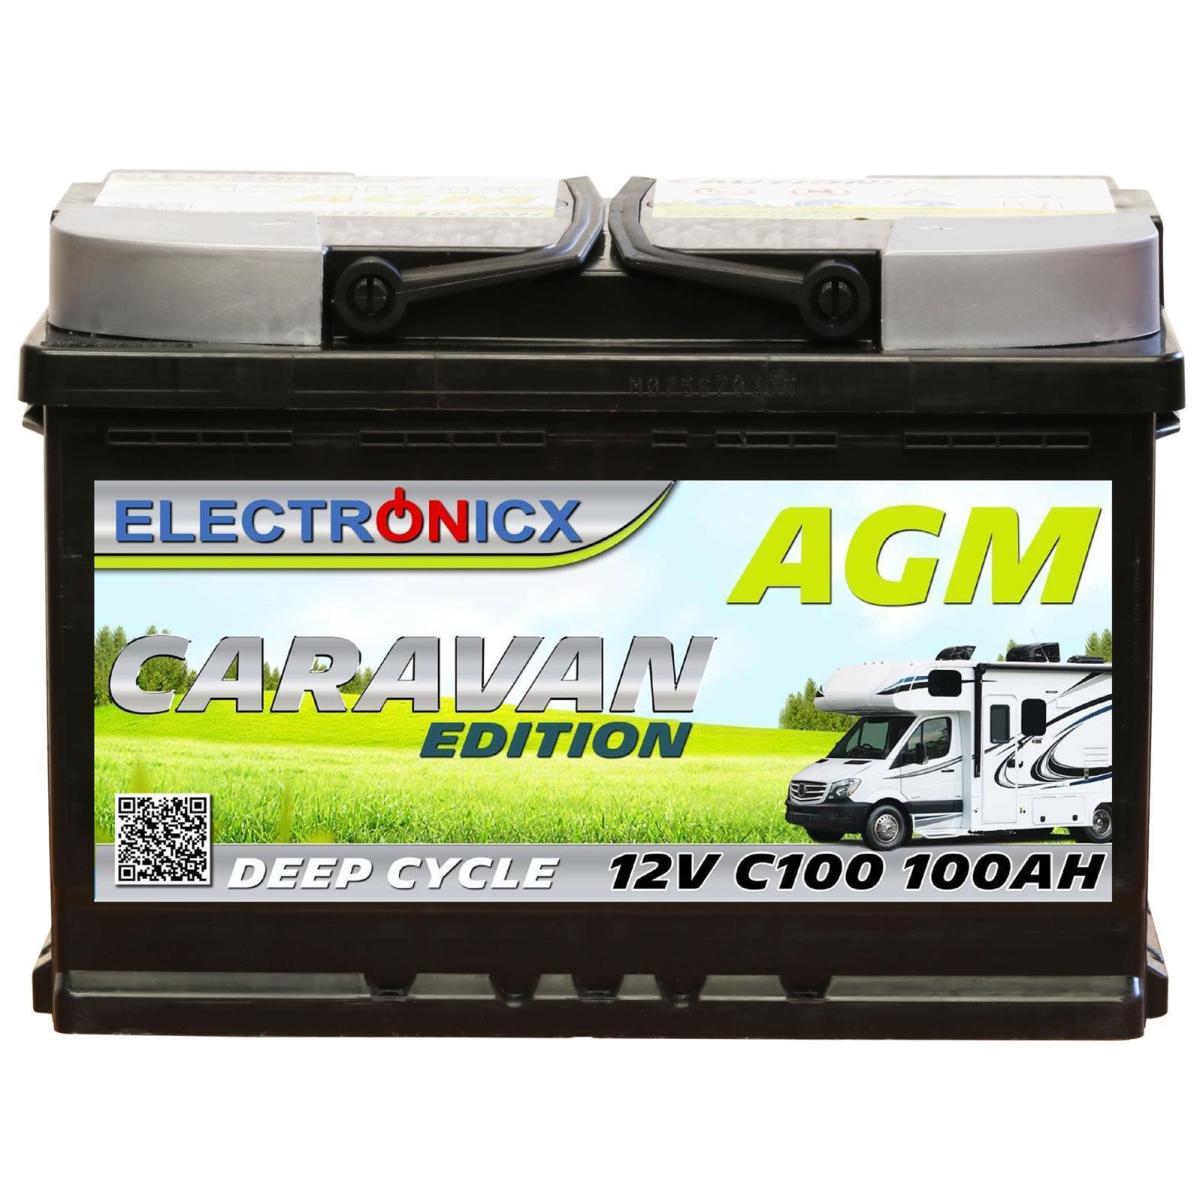 Electronicx Caravan Edition Batterie AGM 100 AH 12V Wohnmobil Boot Versorgung